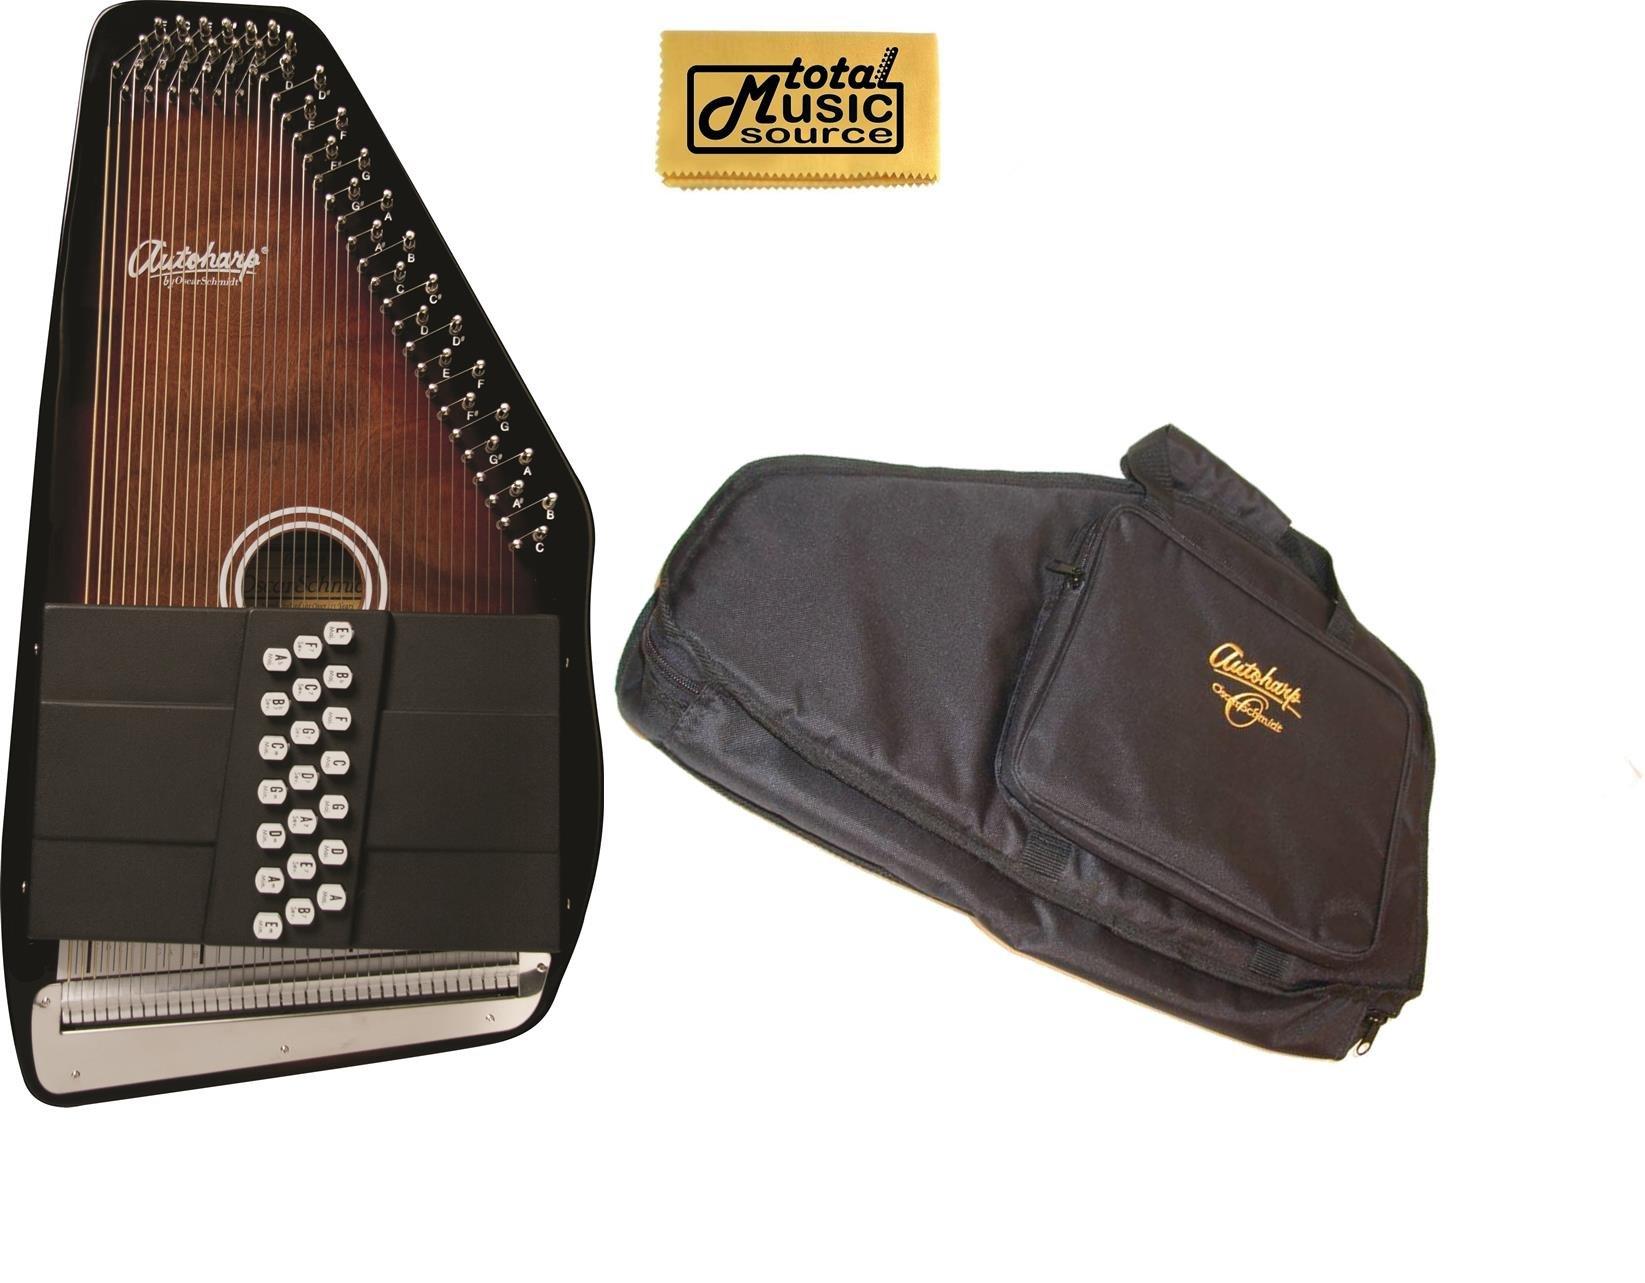 Oscar Schmidt 21 Chord/11 Key A/E Autoharp w/ Gig Bag, Select Maple, OS21CE